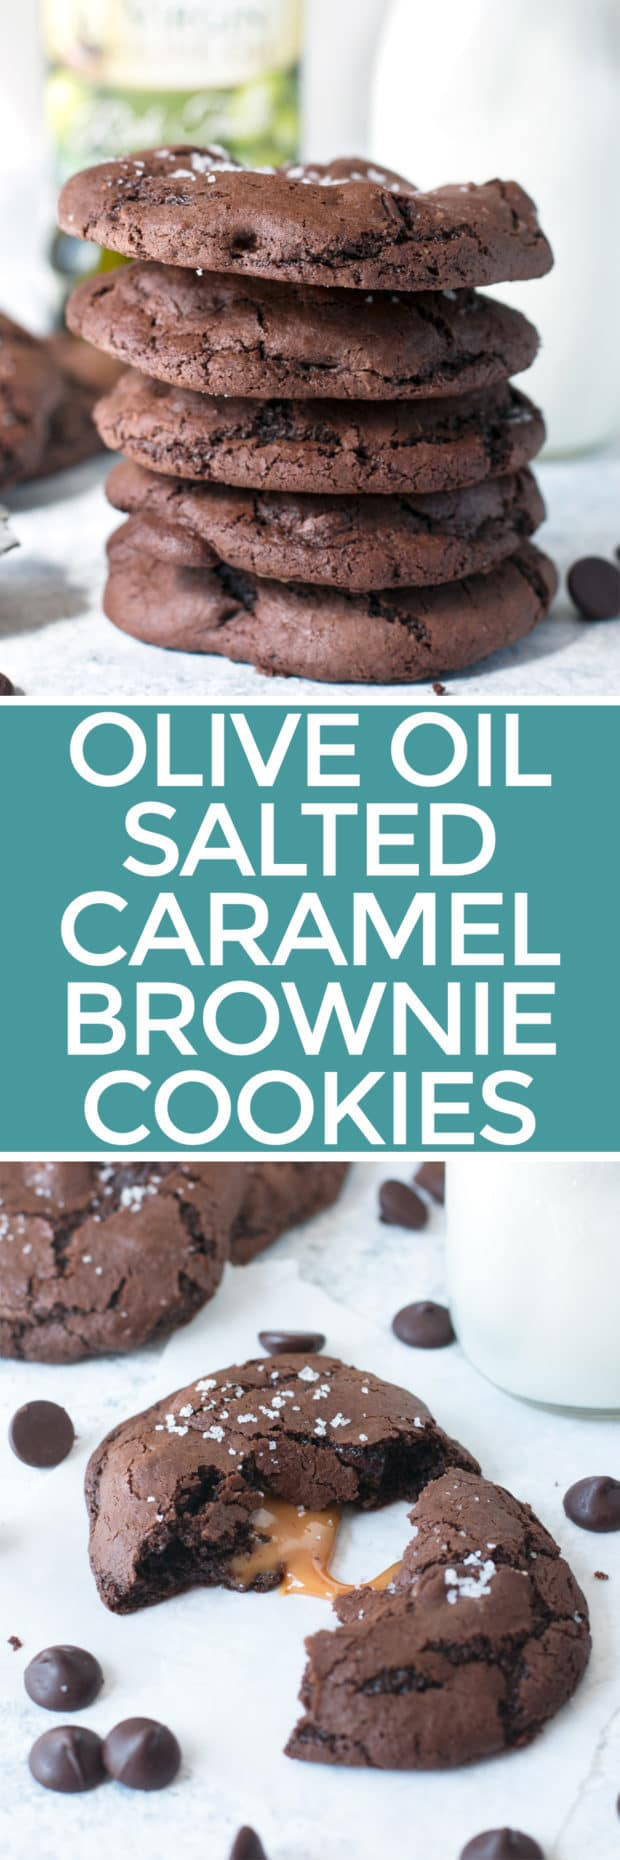 Olive Oil Salted Caramel Brownie Cookies | cakenknife.com #dessert #chocolate #baking #ad